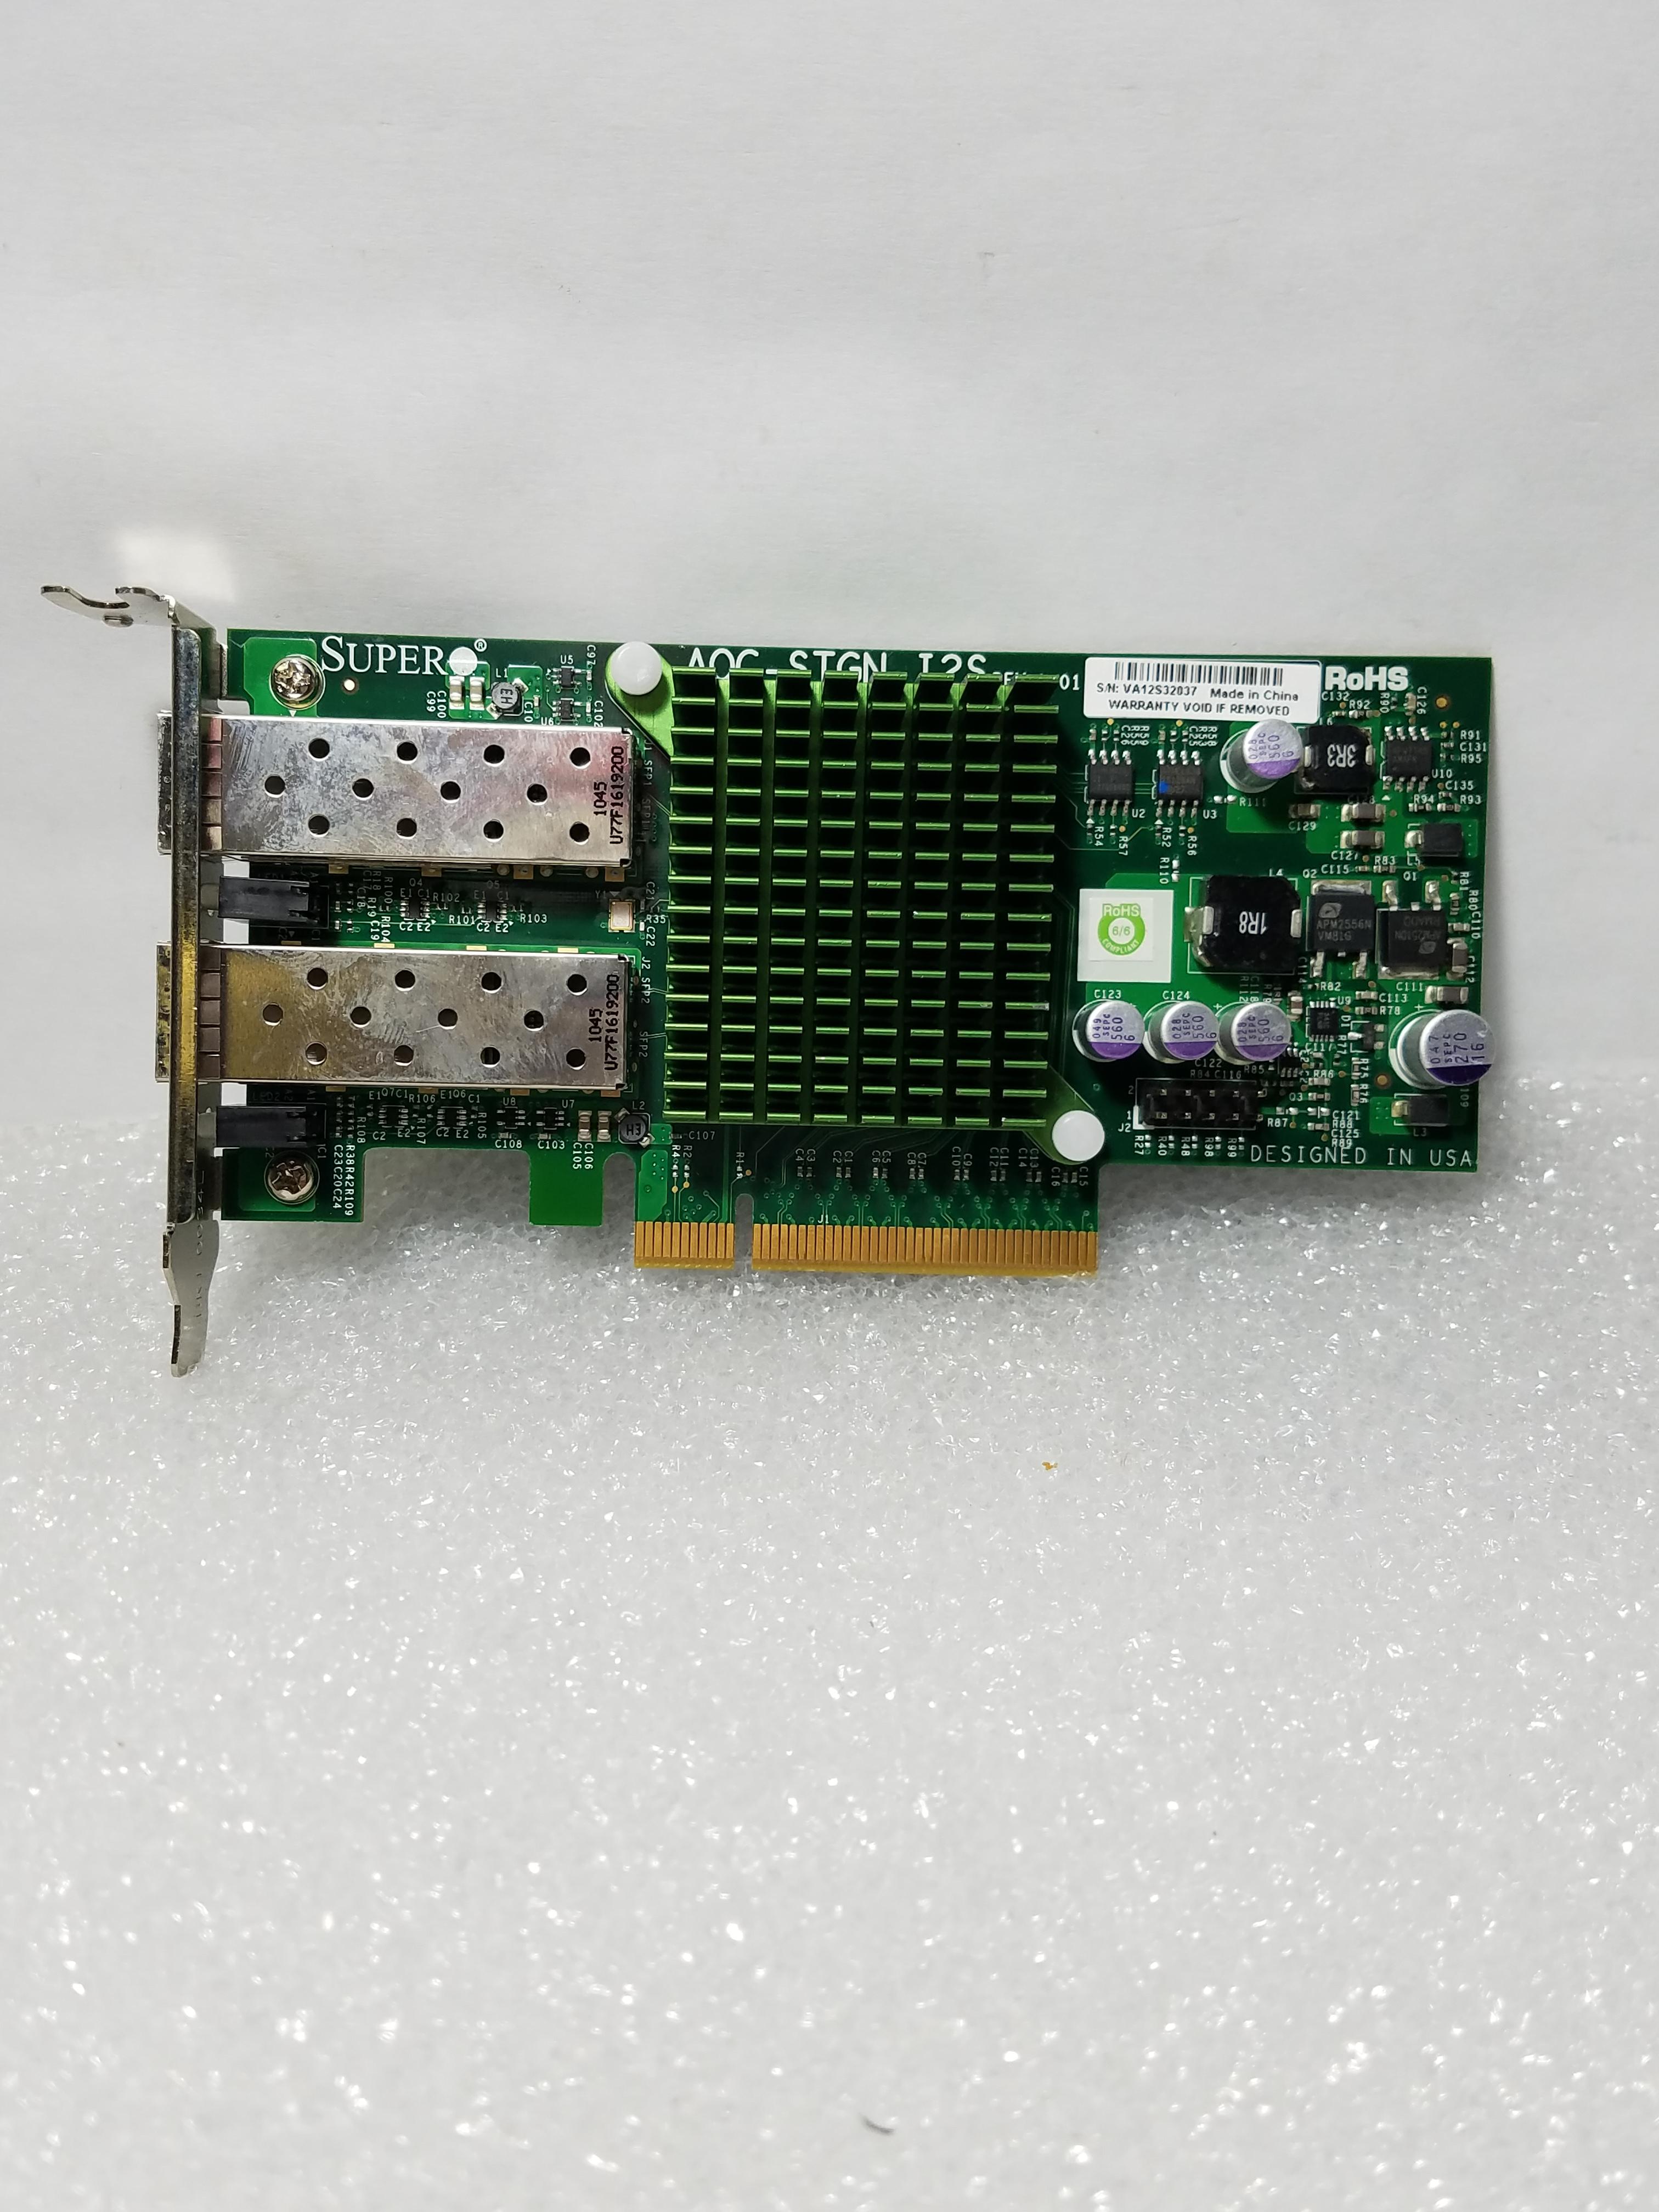 SuperMicro AOC-STGN-I2S Rev: 1 2Port 10GB Ethernet Controller LP Bracket NO  SFPs